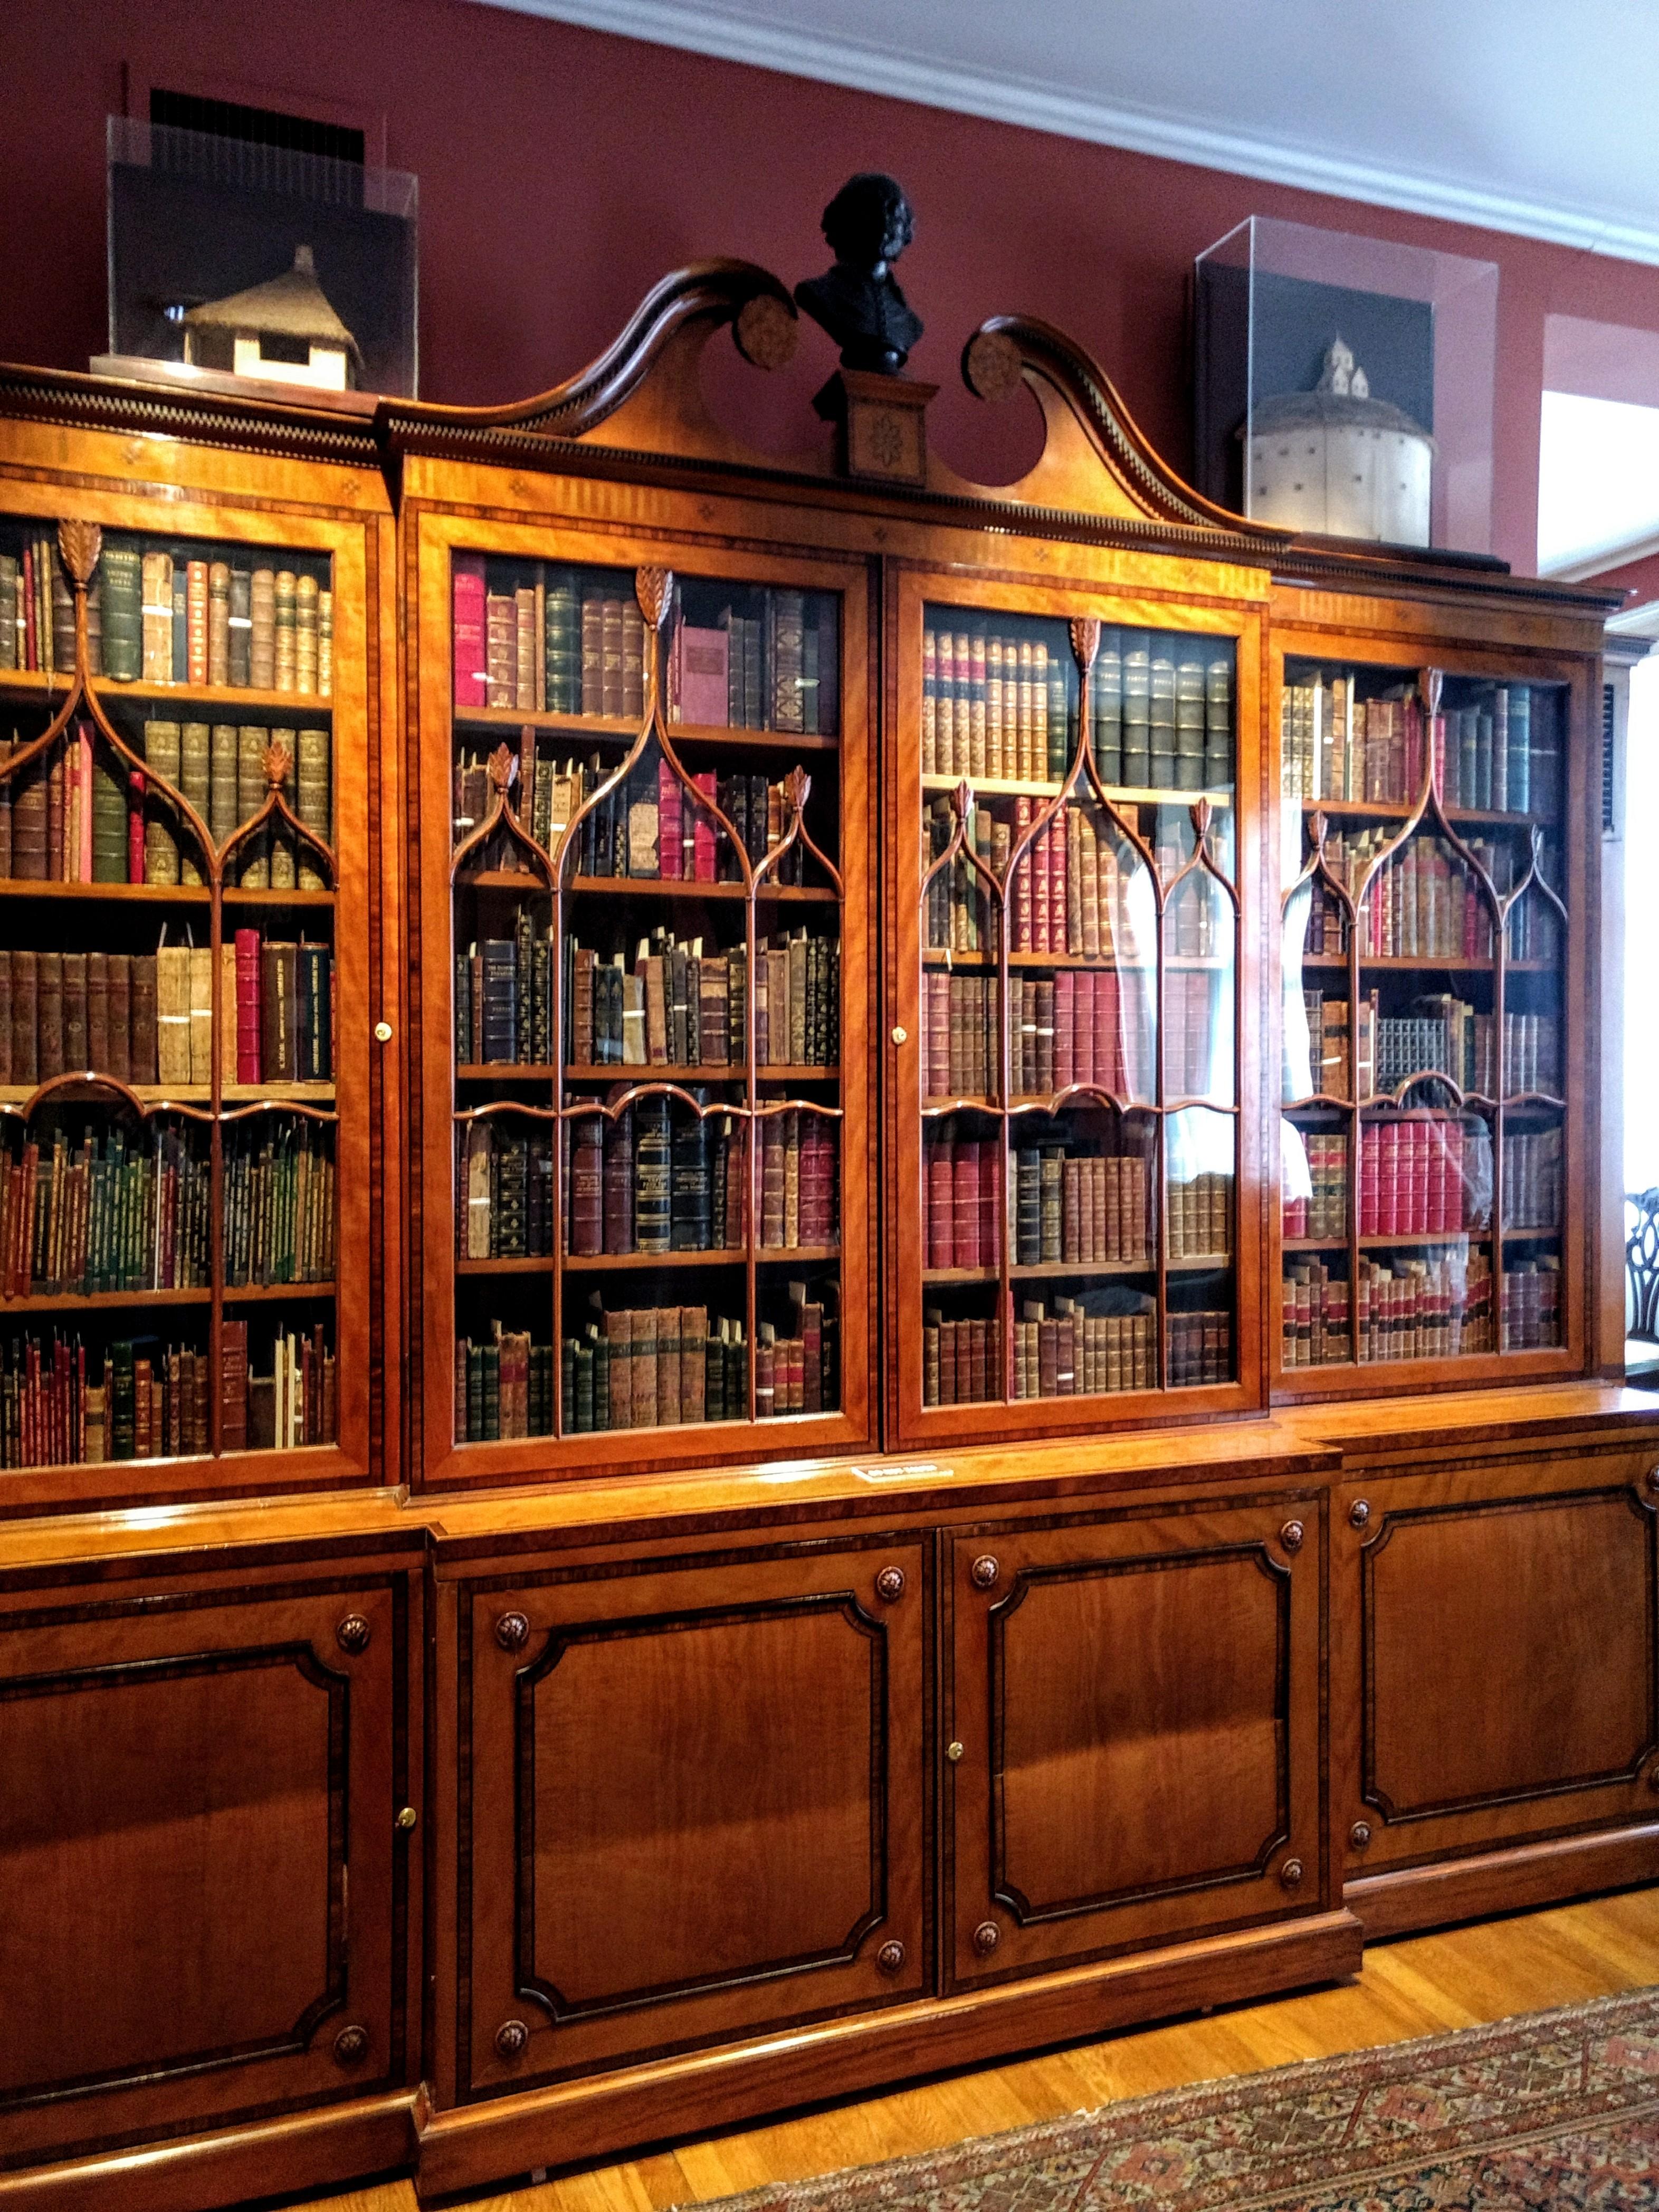 Rosenbach library Philadelphia